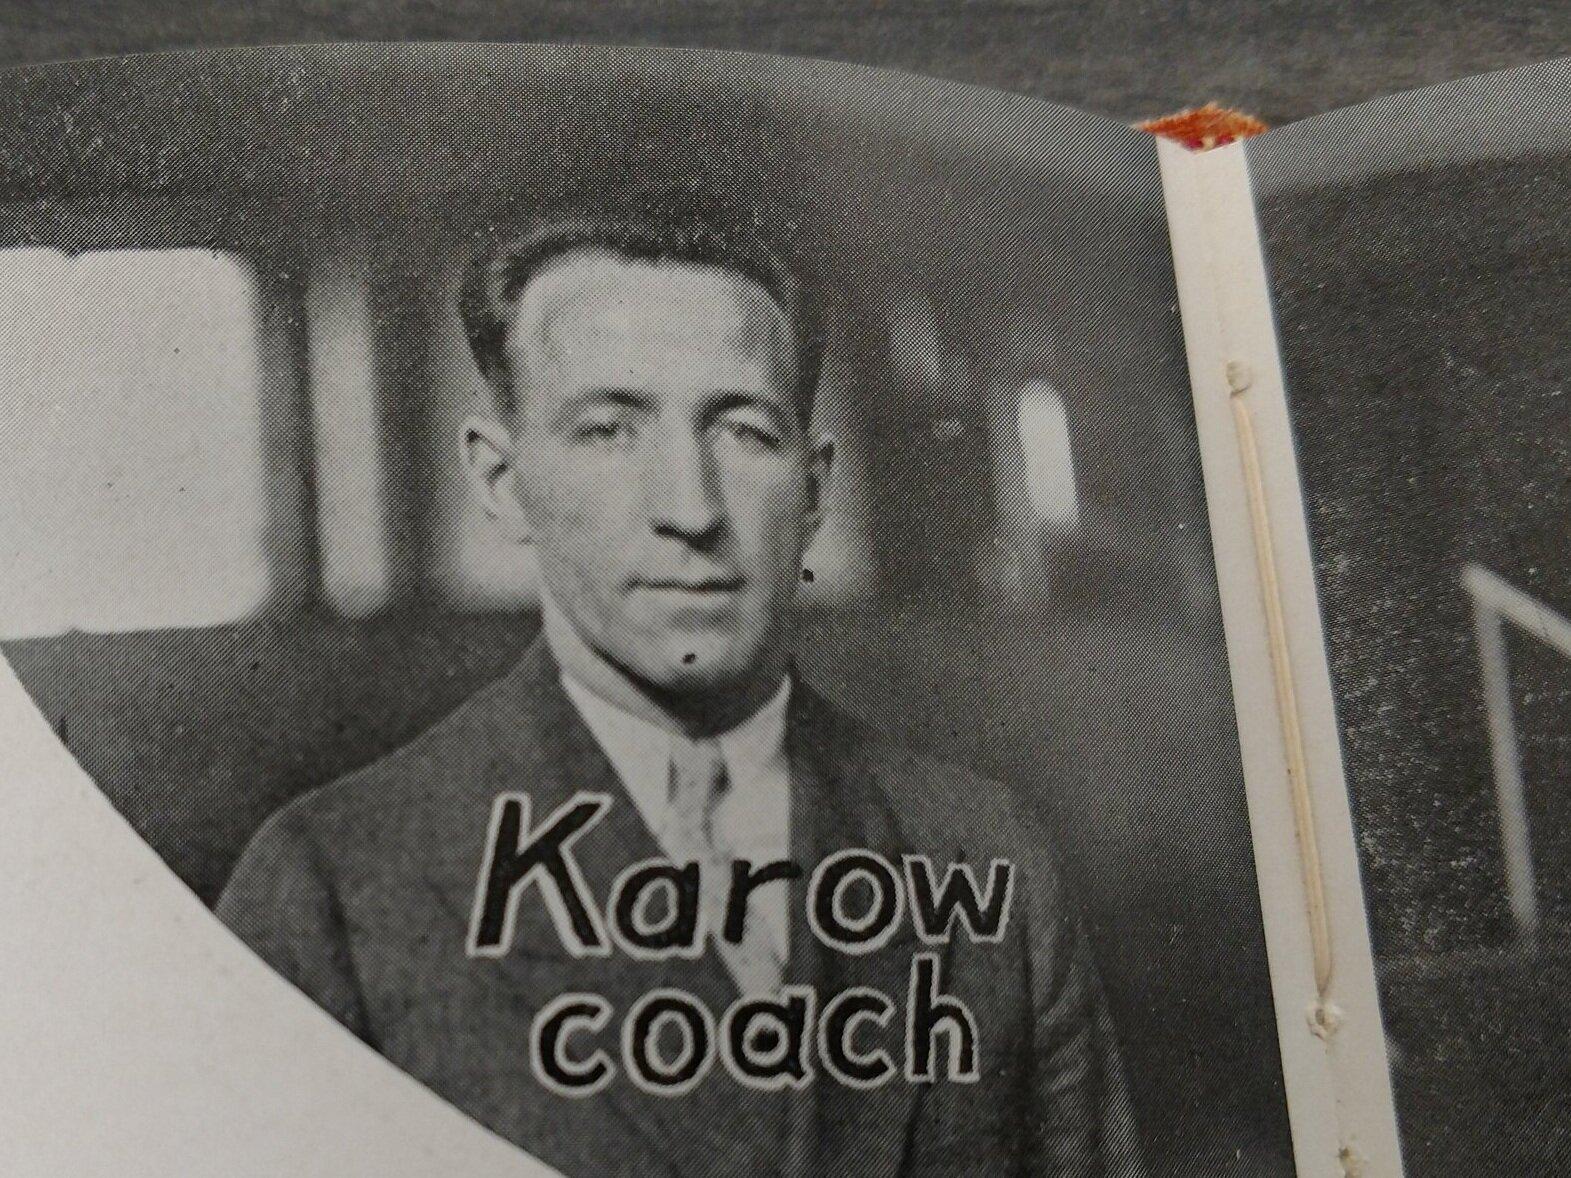 1934-1935+Coach+Karow+basketball+++%2840%29.jpg